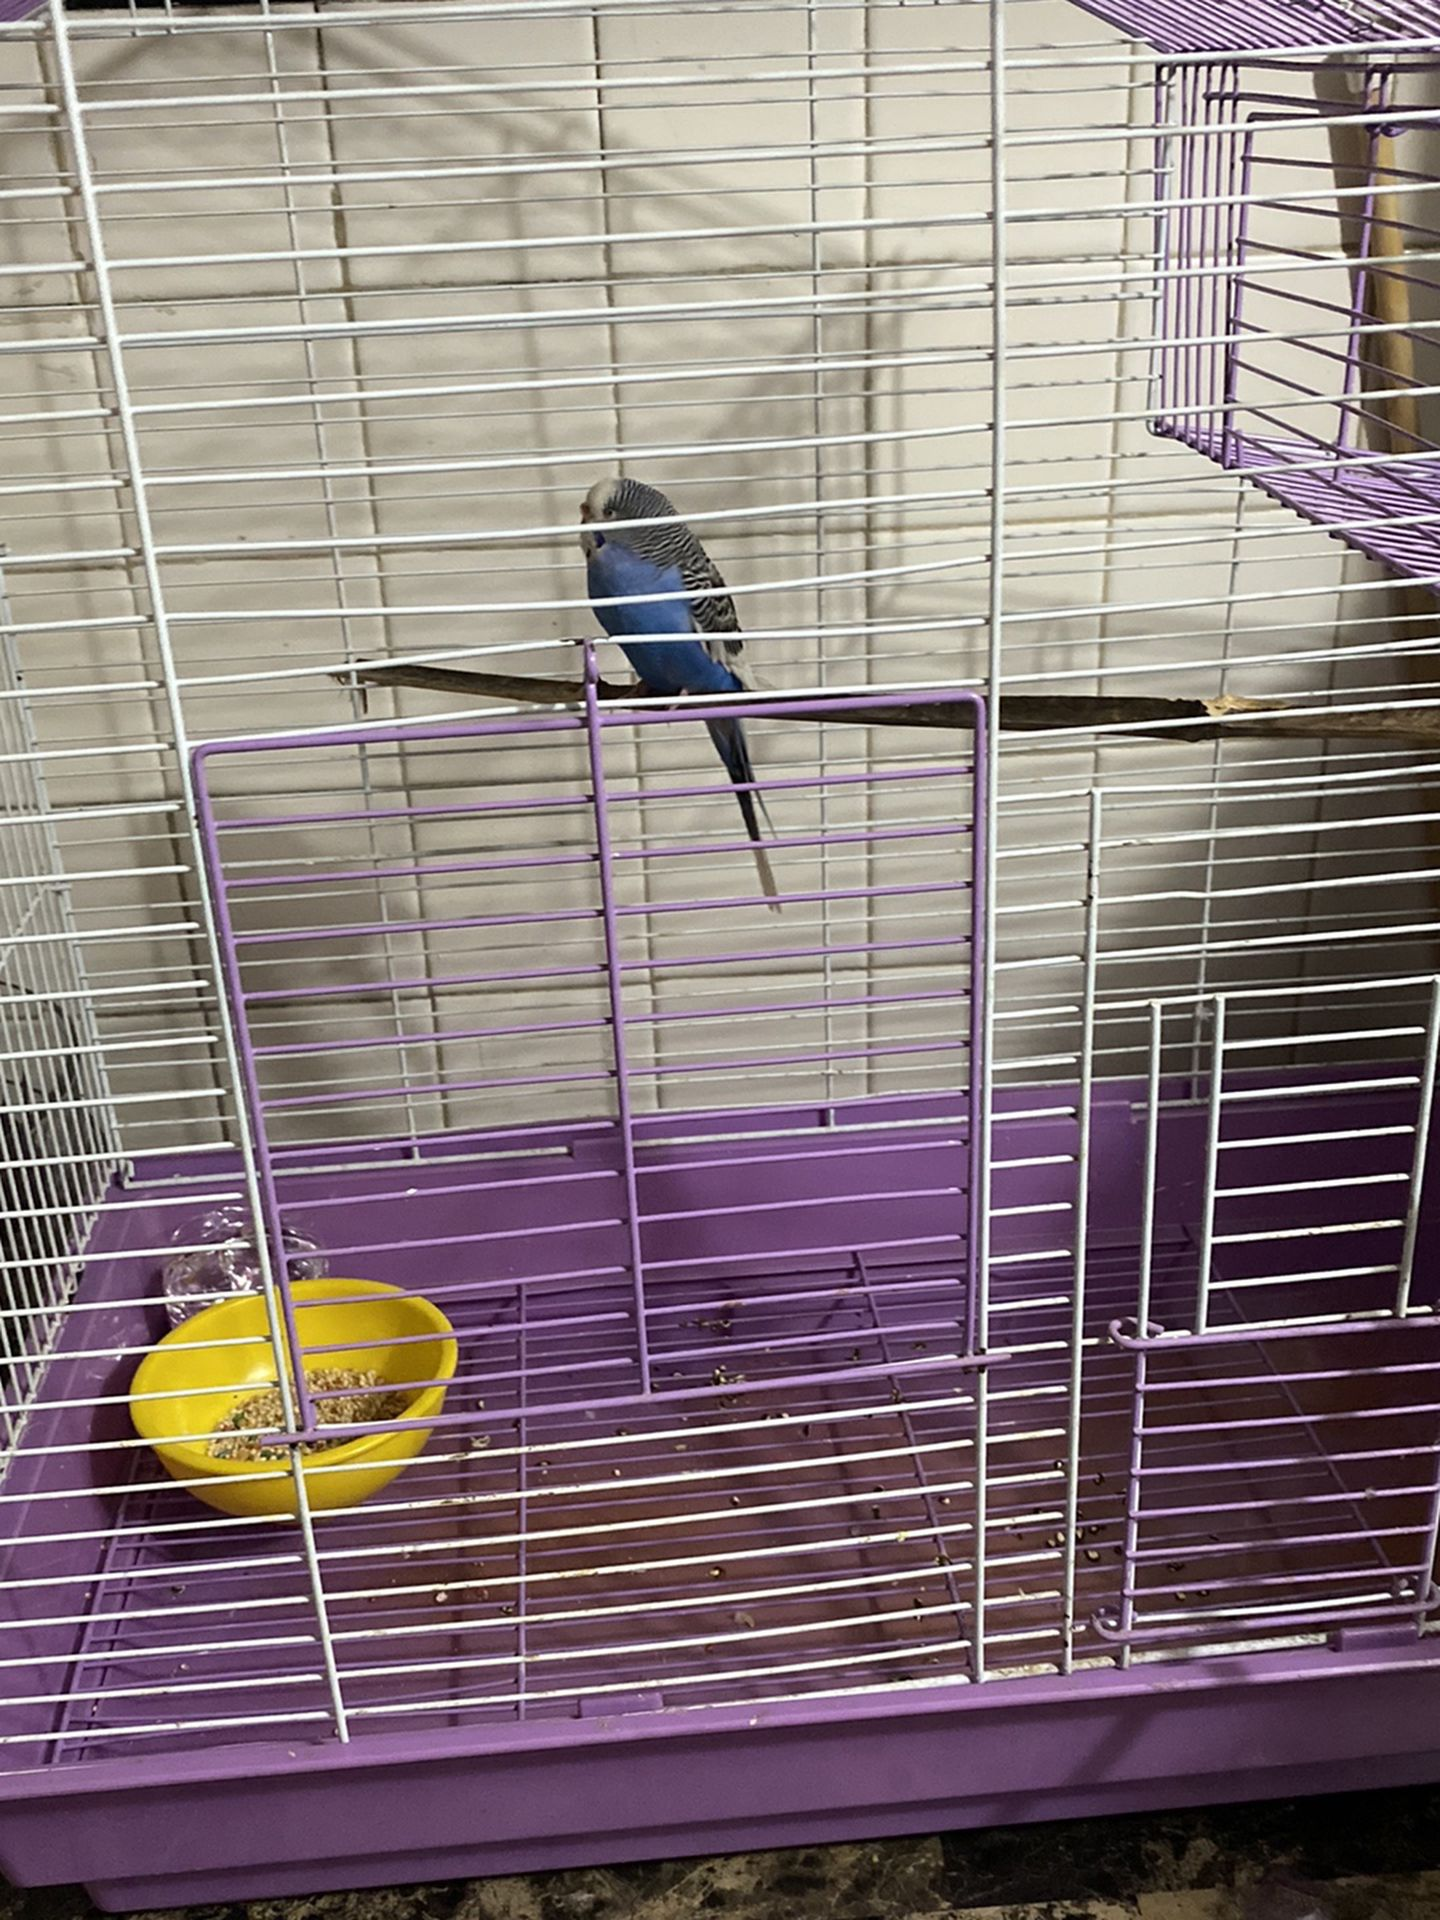 Budgerigar Bird And Cage